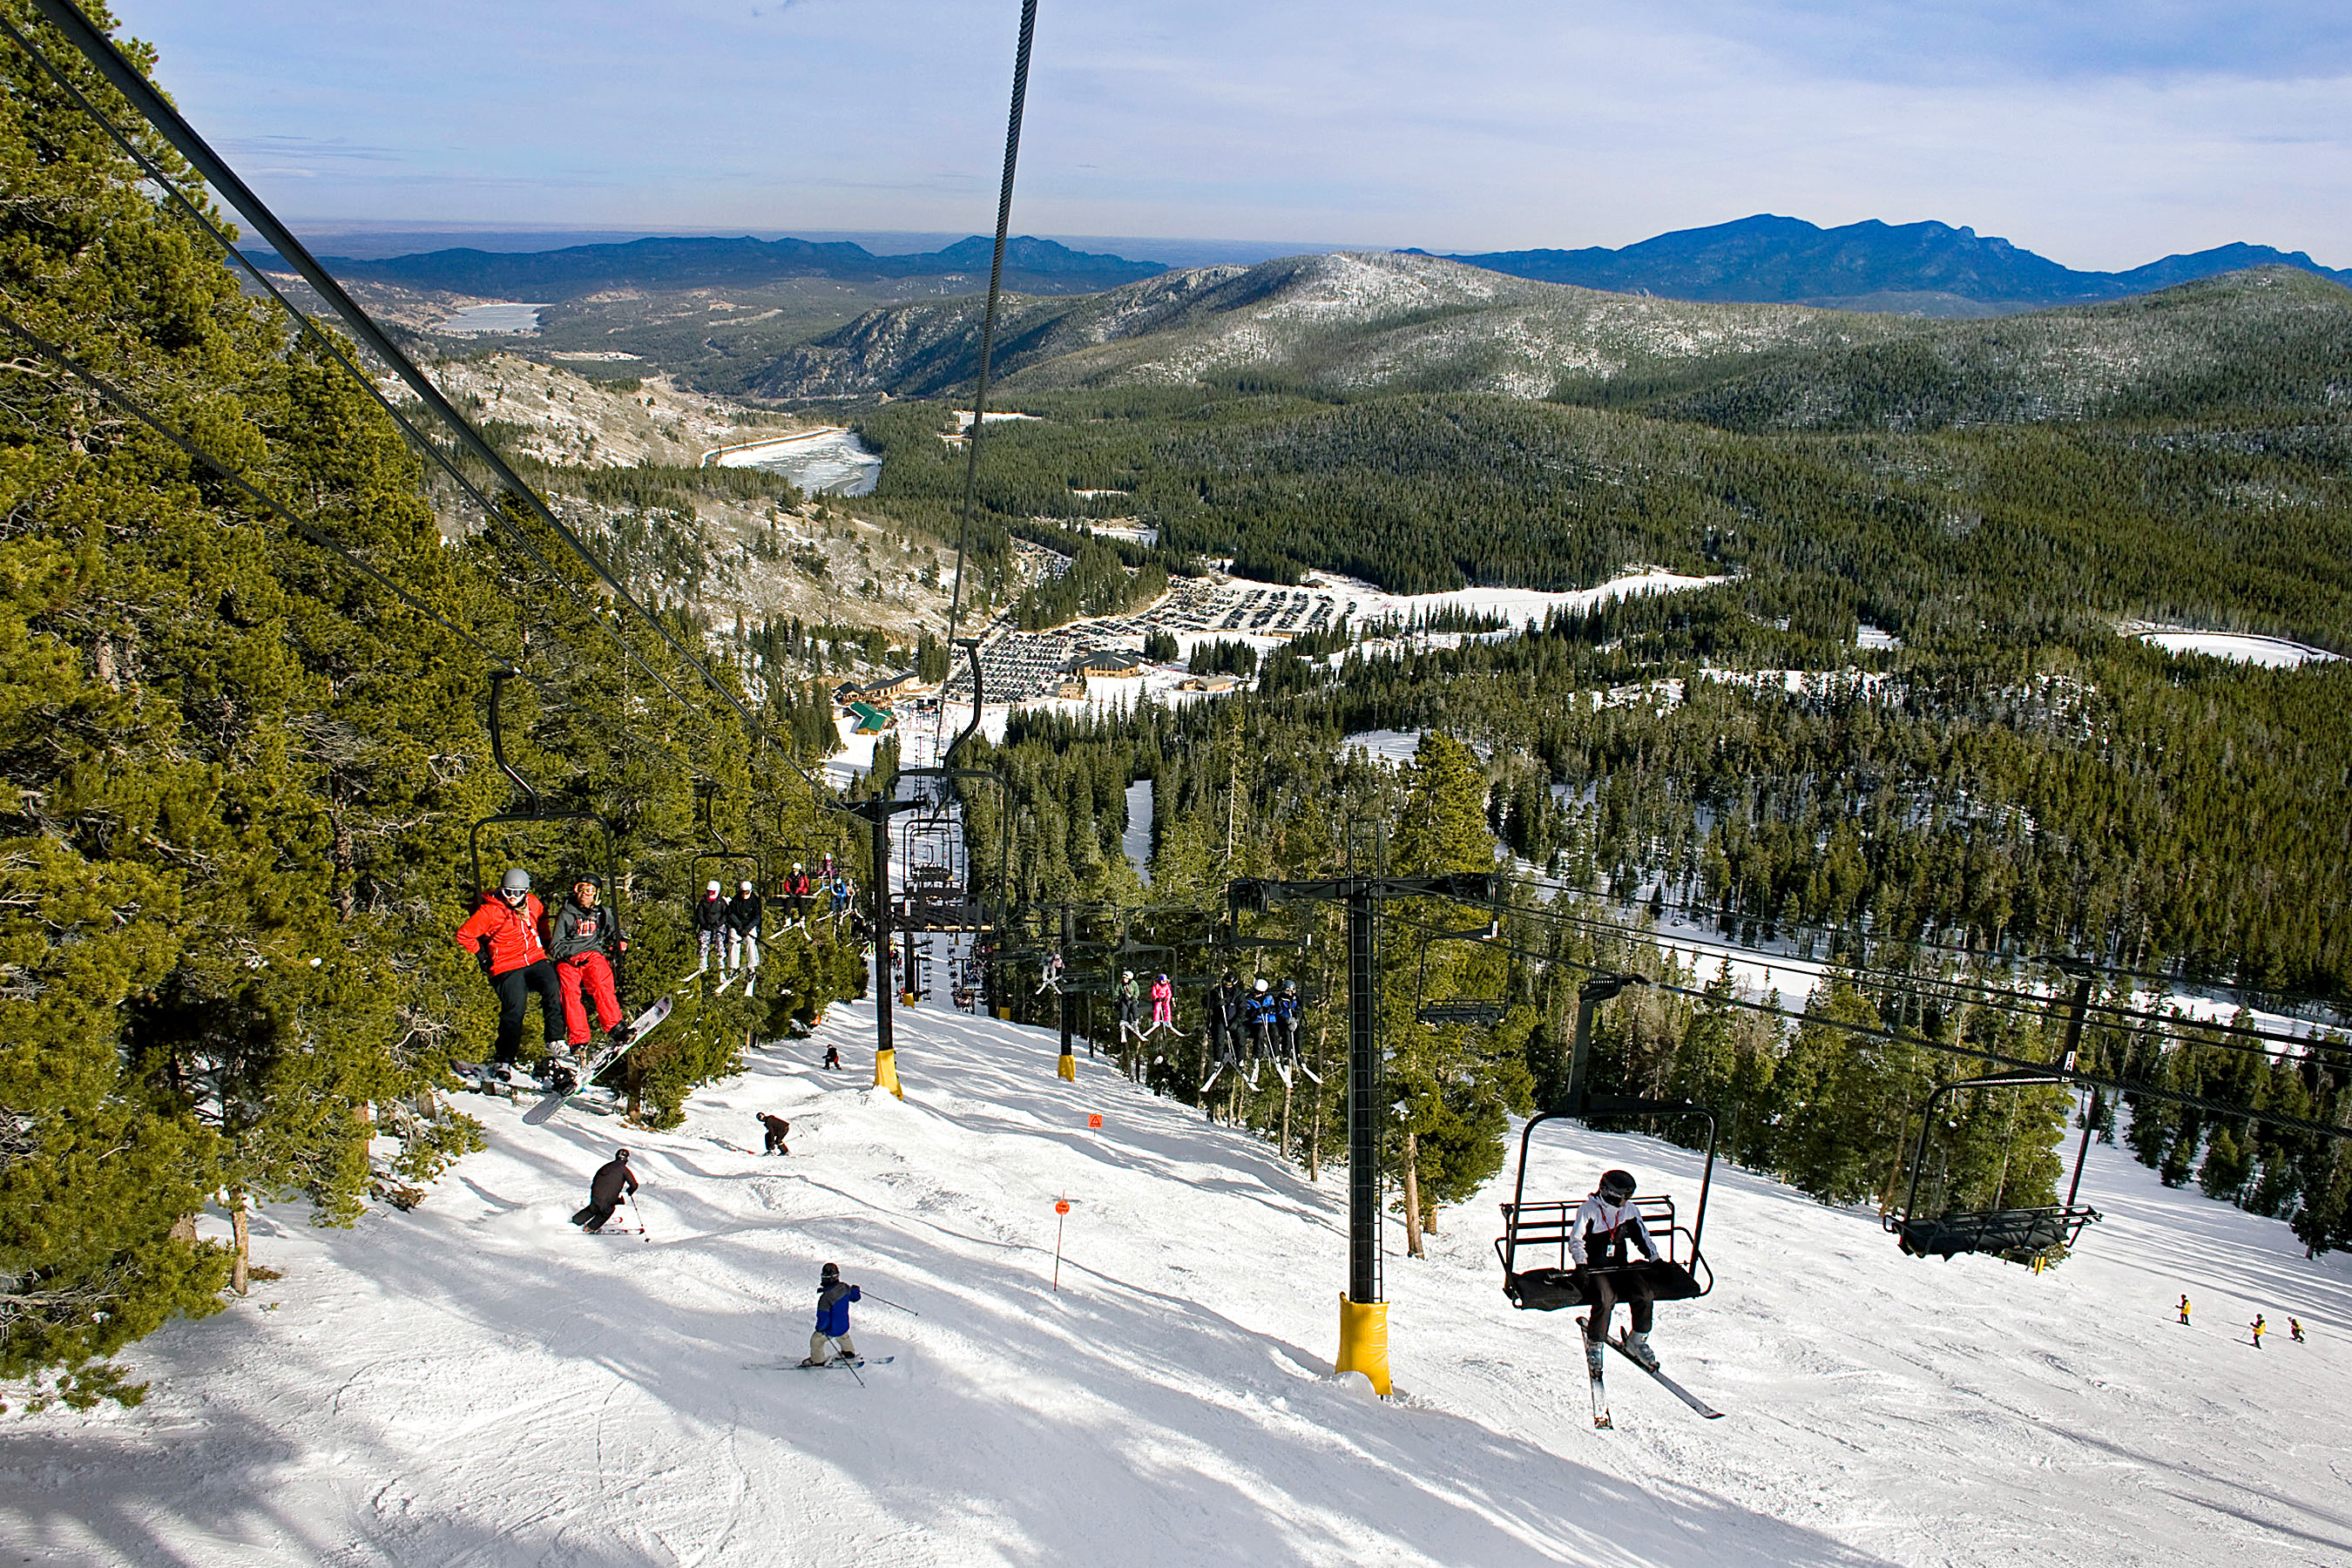 Skiers ride the lift at Eldora Mountain Resort near Colorado Springs.